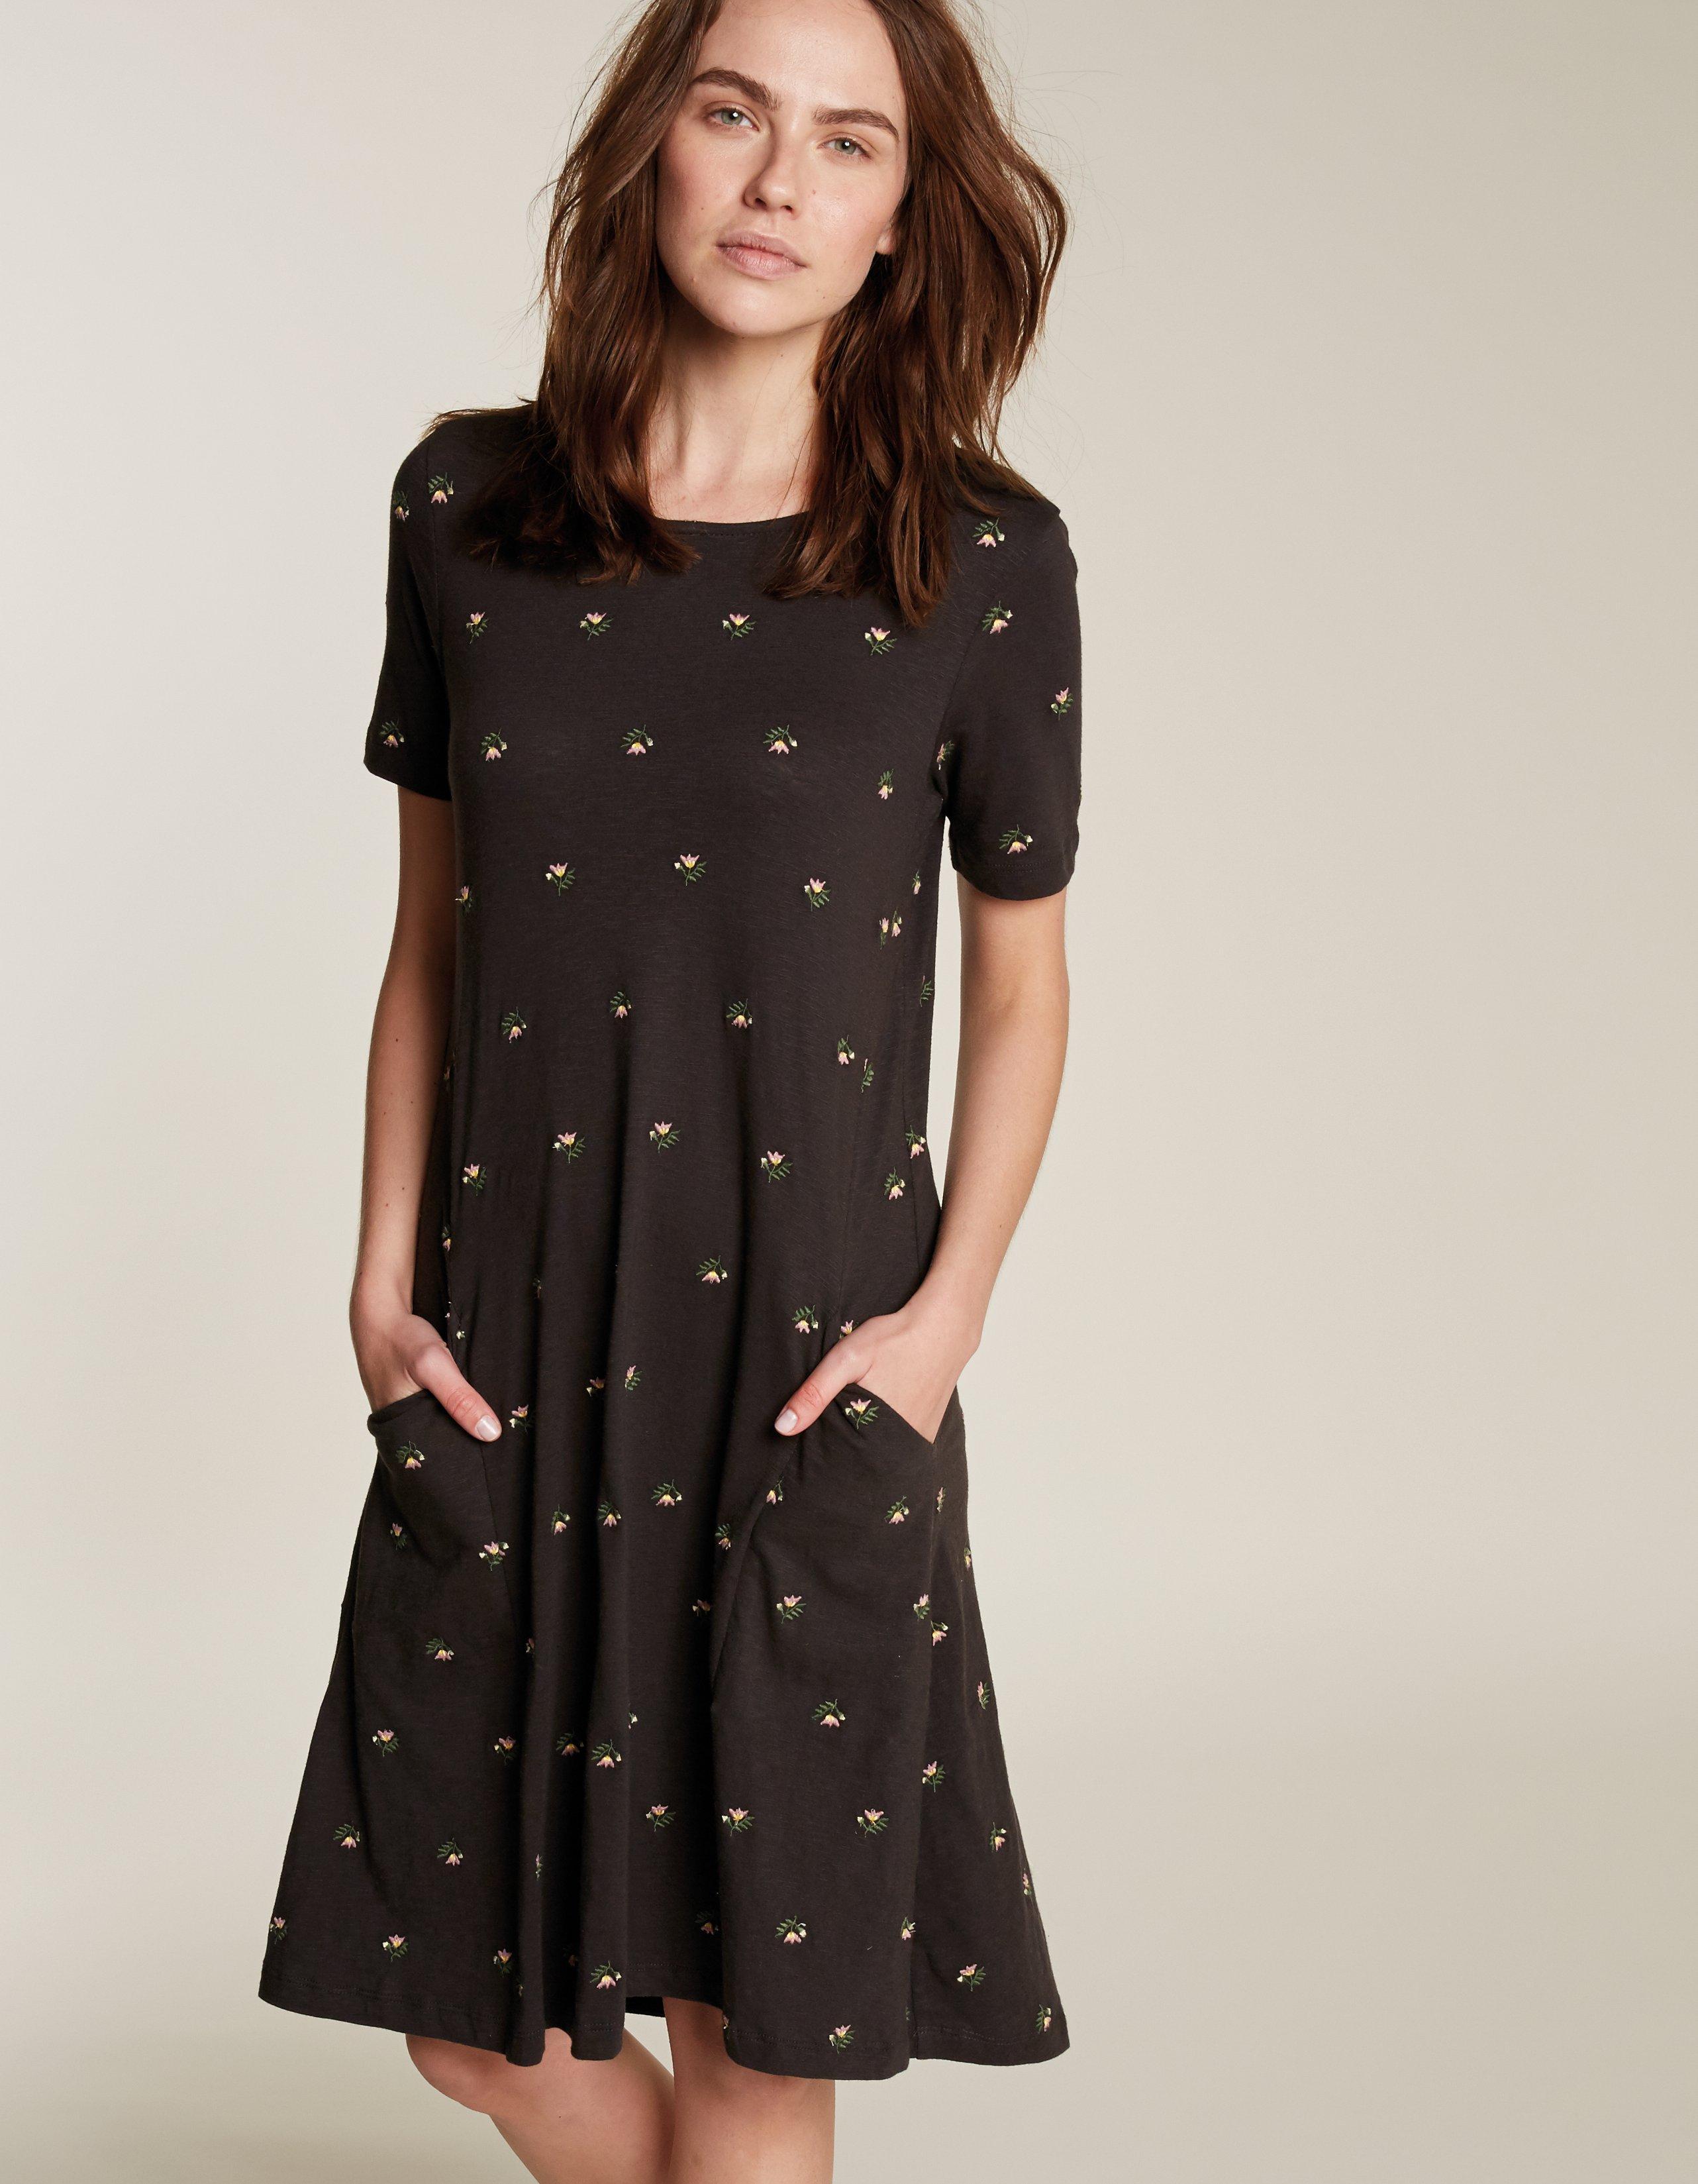 Fatface Tunic Dress